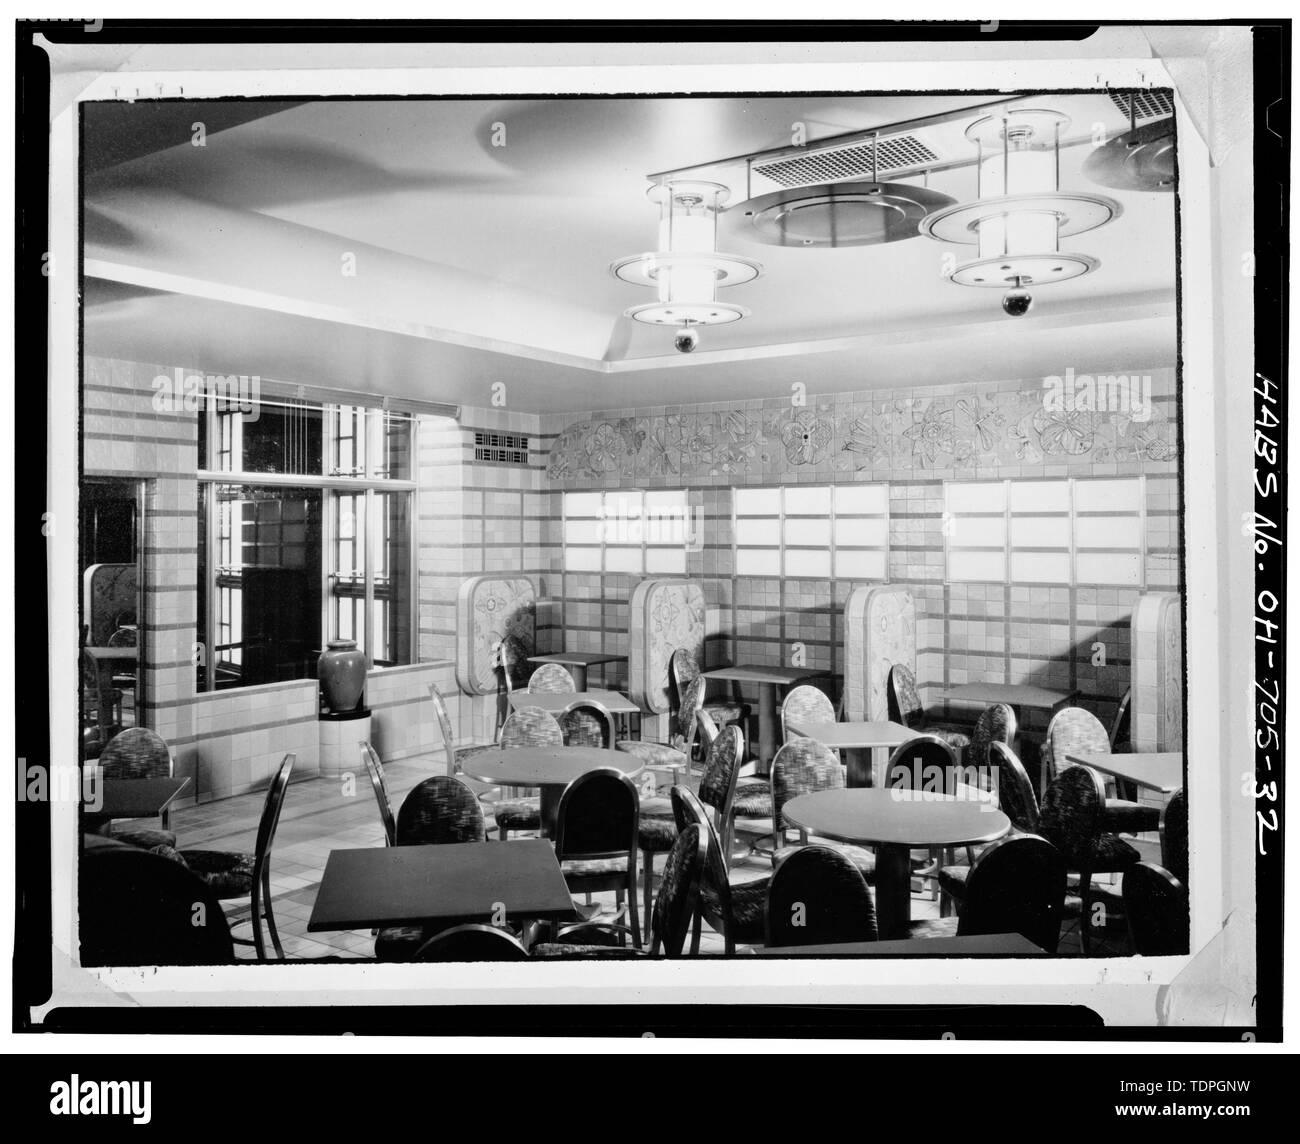 ROOKWOOD TEAROOM, LOOKING NORTHEAST - Cincinnati Union Terminal, 1301 Western Avenue, Cincinnati, Hamilton County, OH - Stock Image